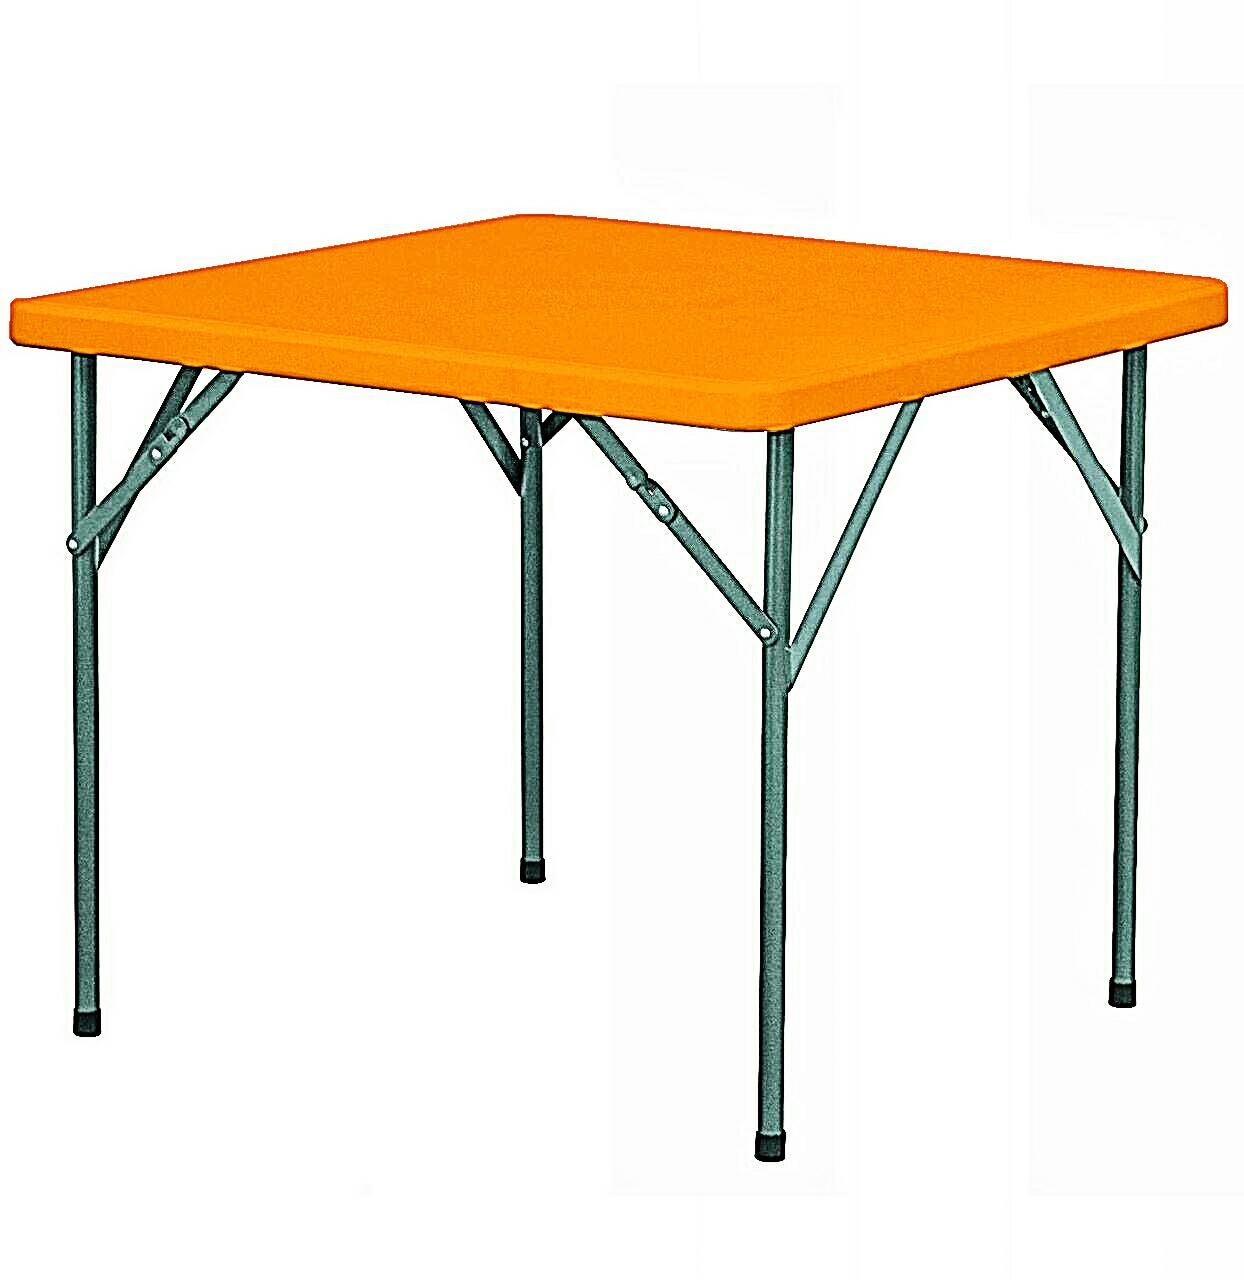 foldable plastic table. Black Bedroom Furniture Sets. Home Design Ideas